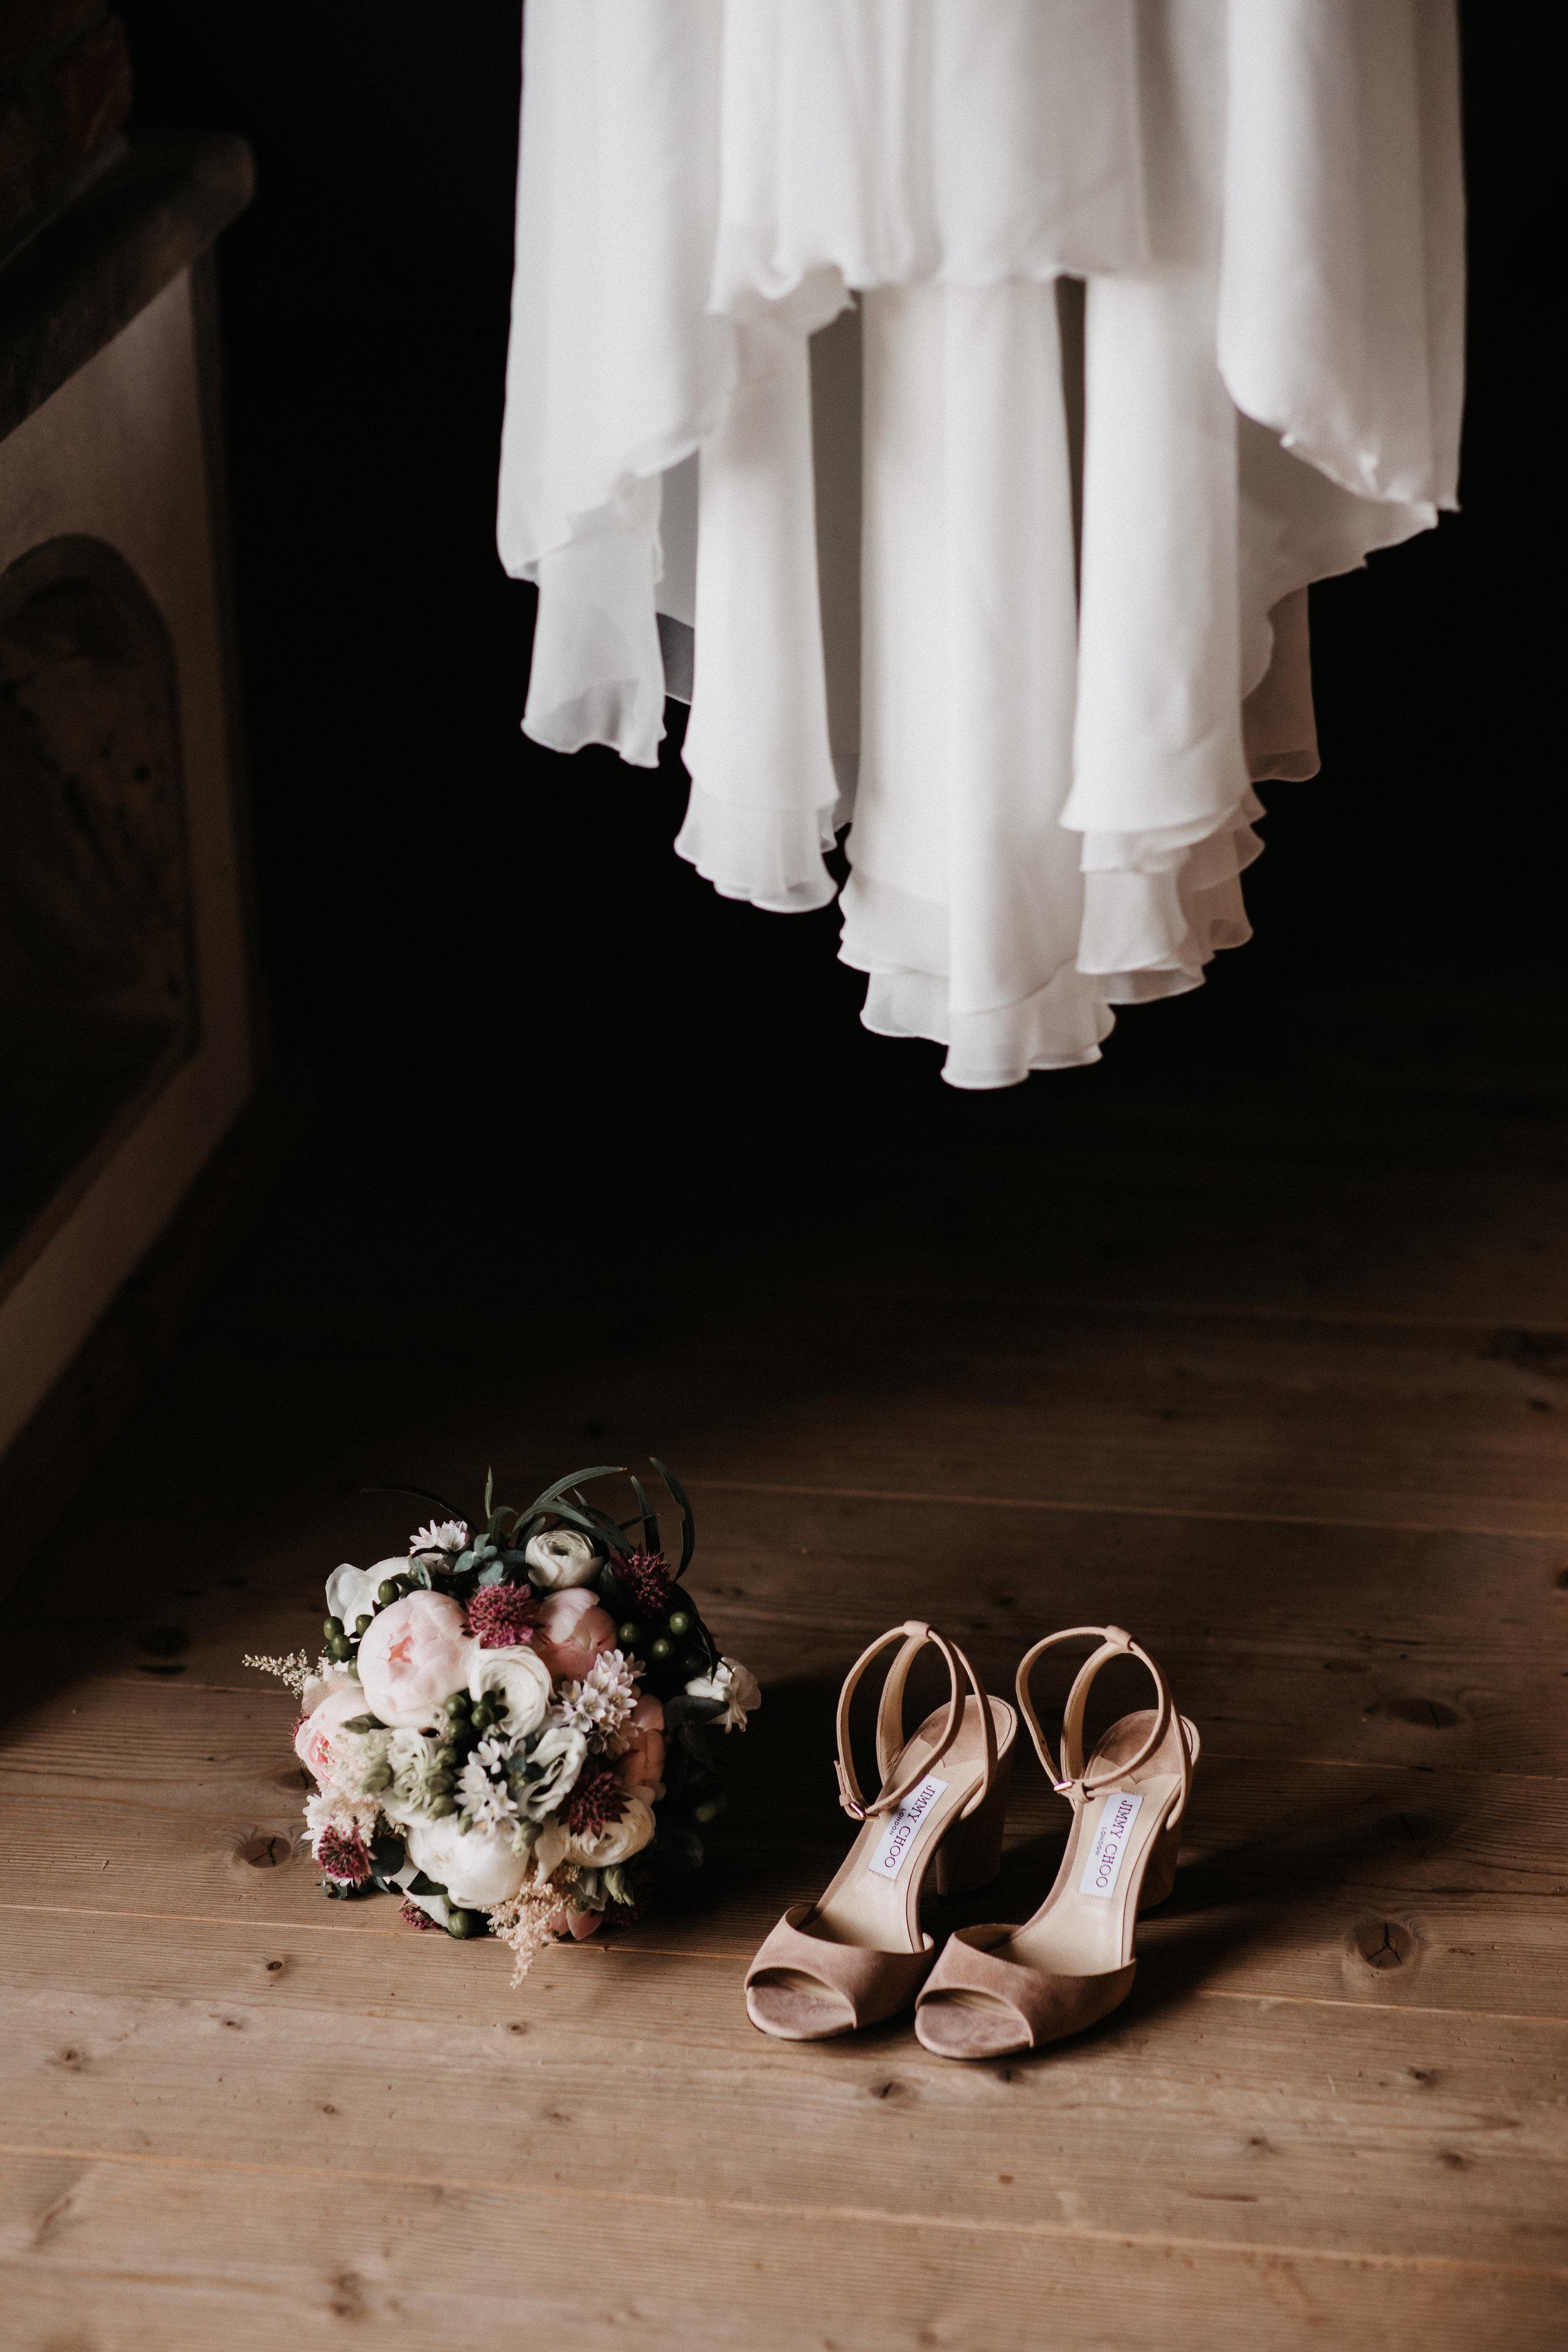 rosemarrylemon_ab_Hochzeitsplanung10.jpg